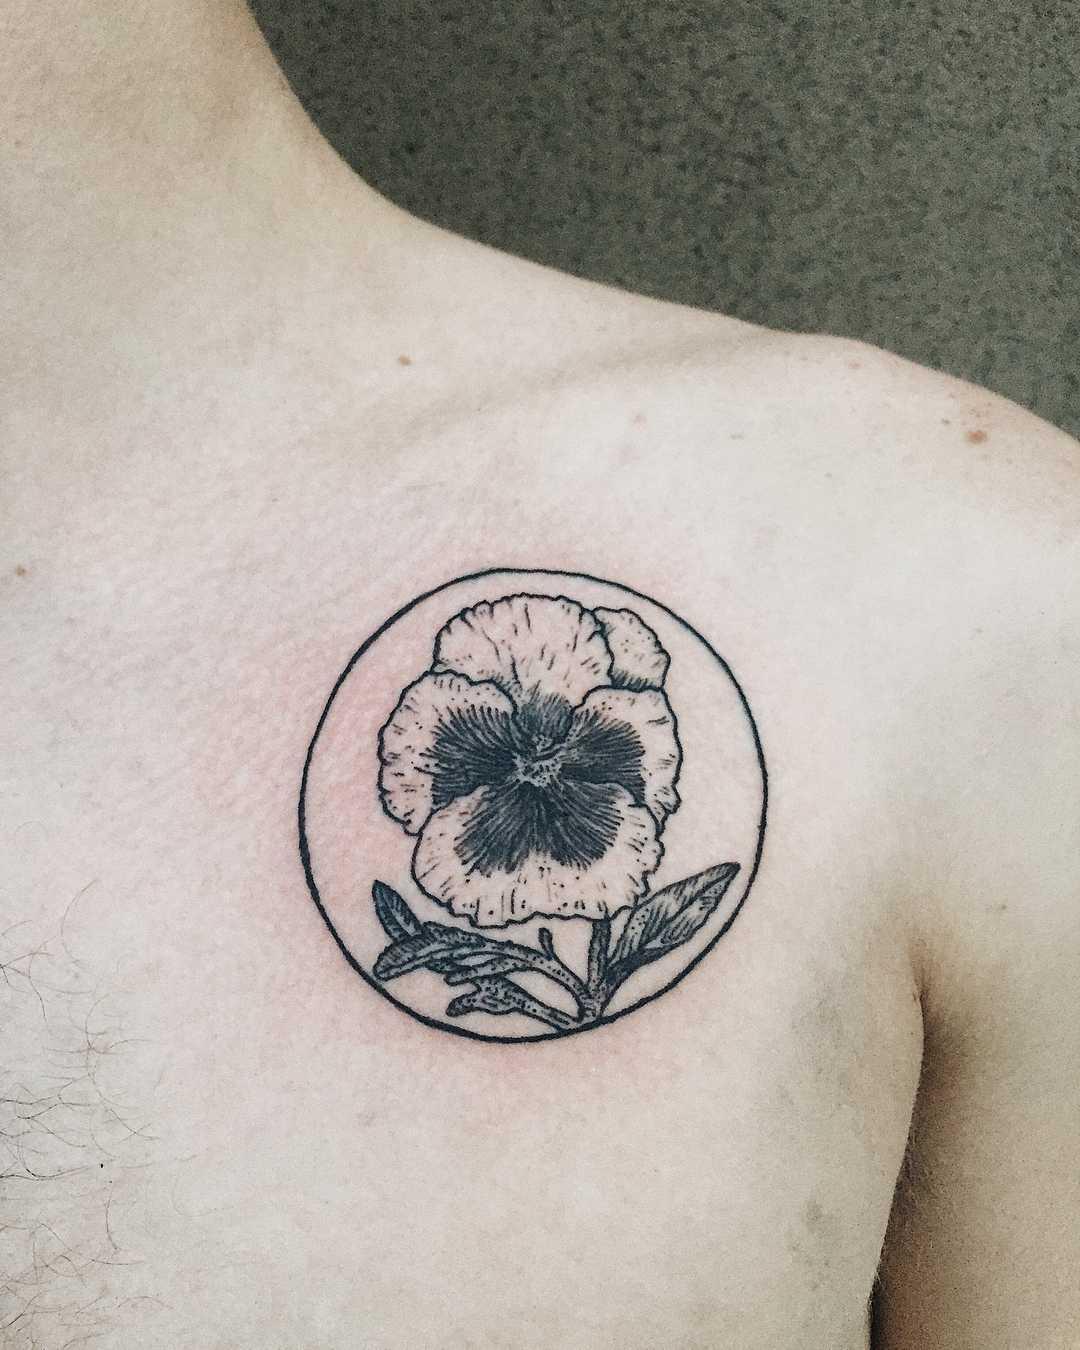 Pansy tattoo by Finley Jordan